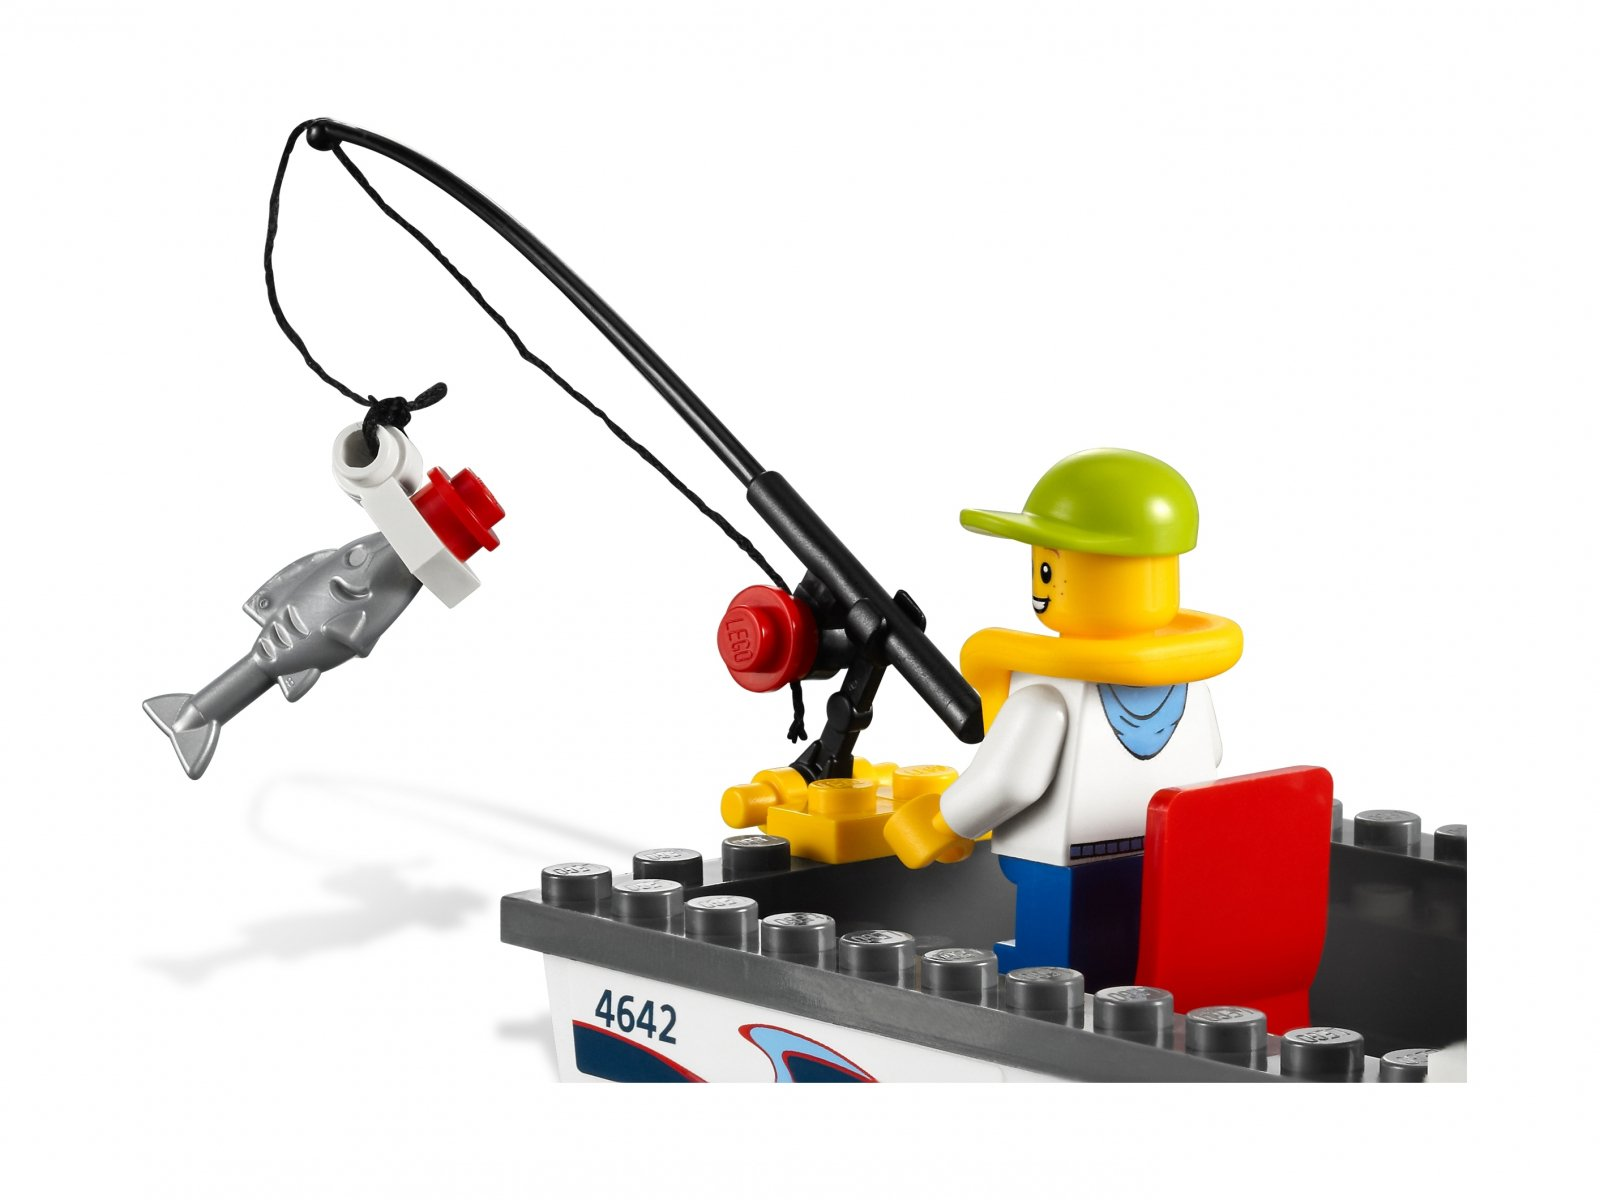 LEGO City Jacht motorowy 4642